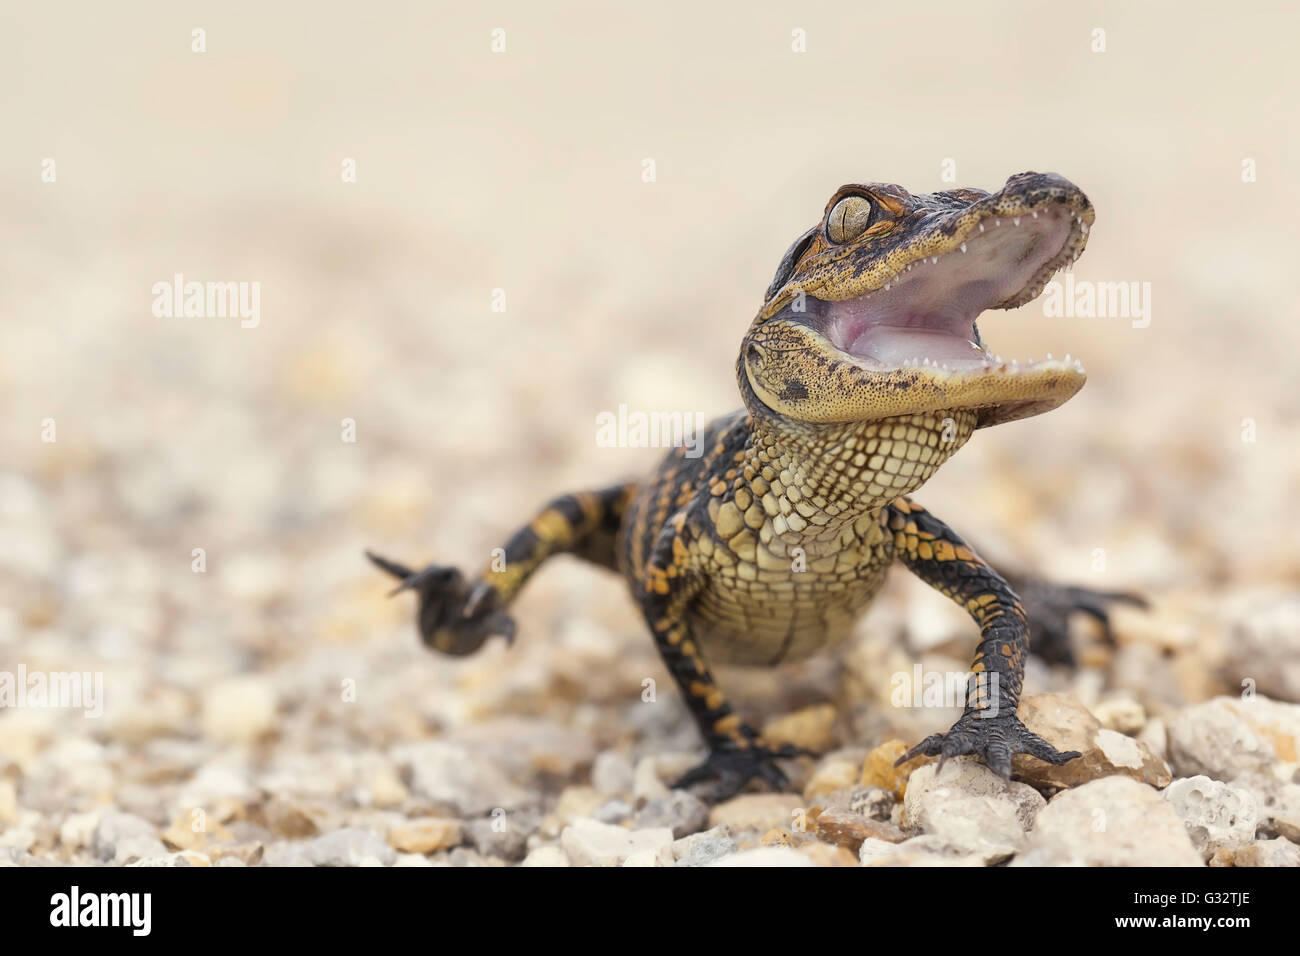 American Alligator (Alligator mississippiensis) hatchling, Florida, America, USA - Stock Image